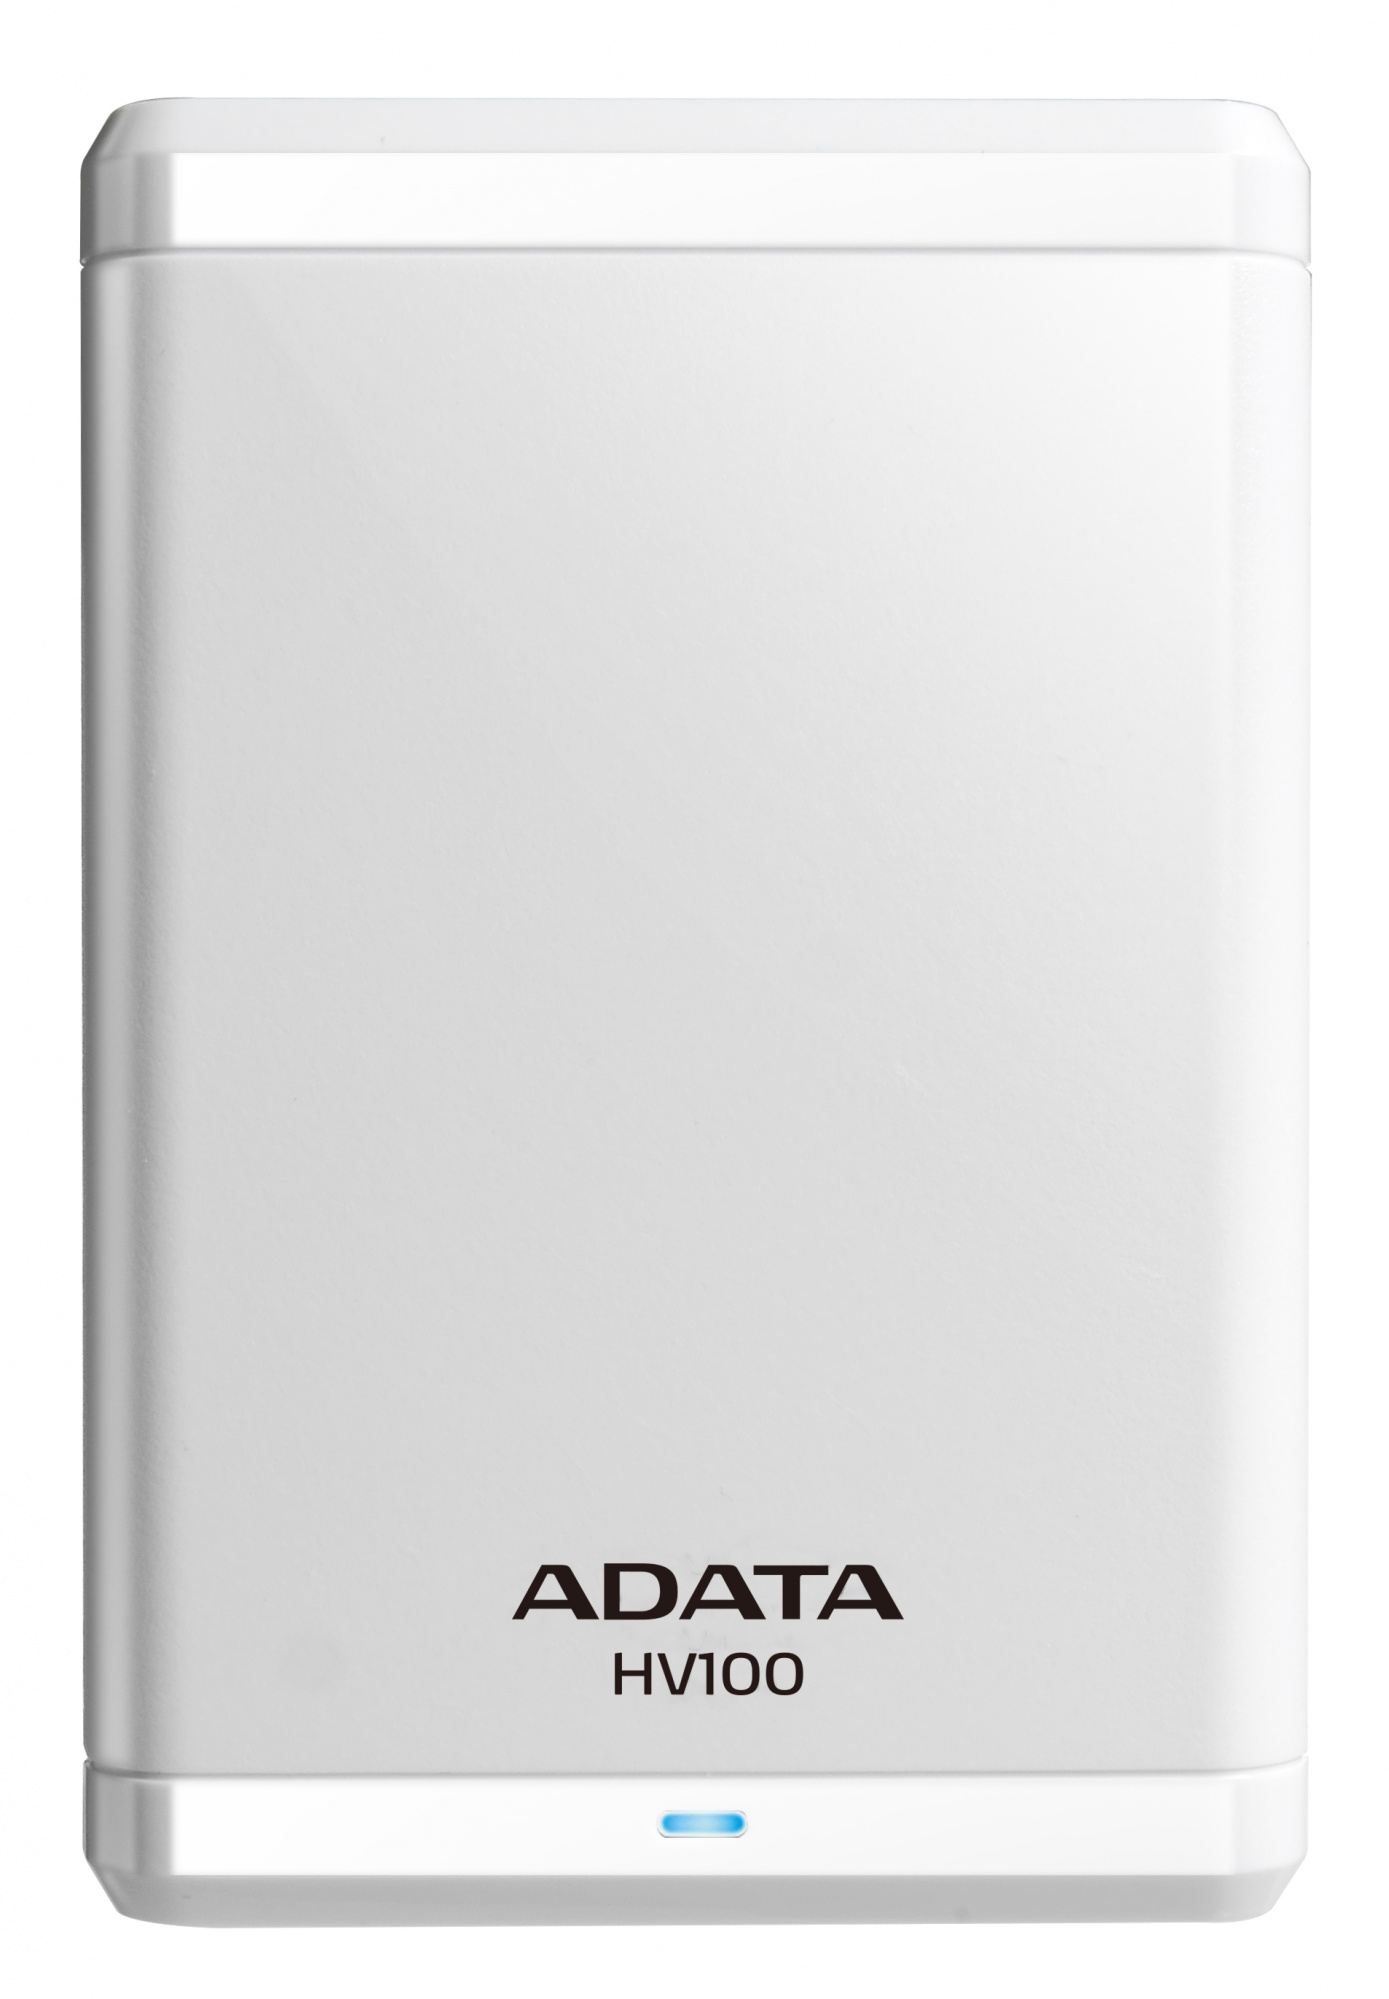 "Adata HV100 2.5"", 2Tb, USB 3.0 (AHV100-2TU3-CWH) - внешний жесткий диск (White)"